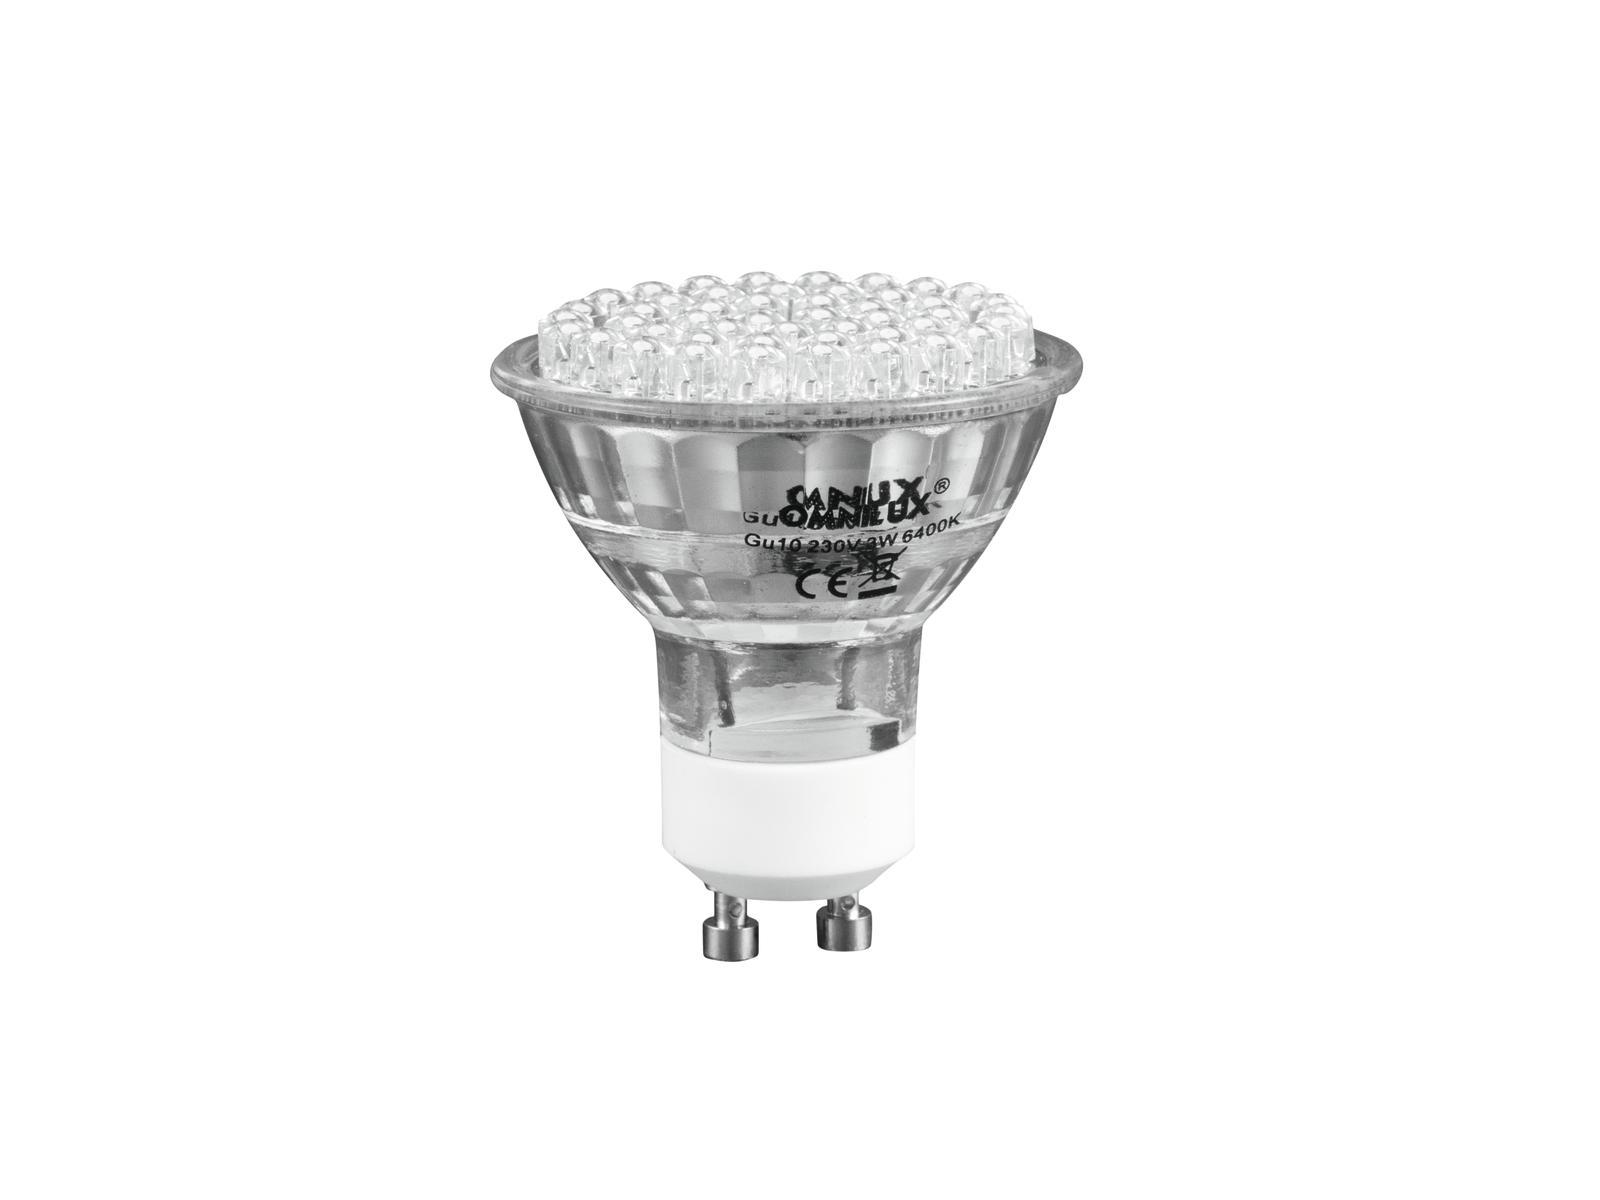 OMNILUX GU-10 230V 48 LED 100° bianco 6400K